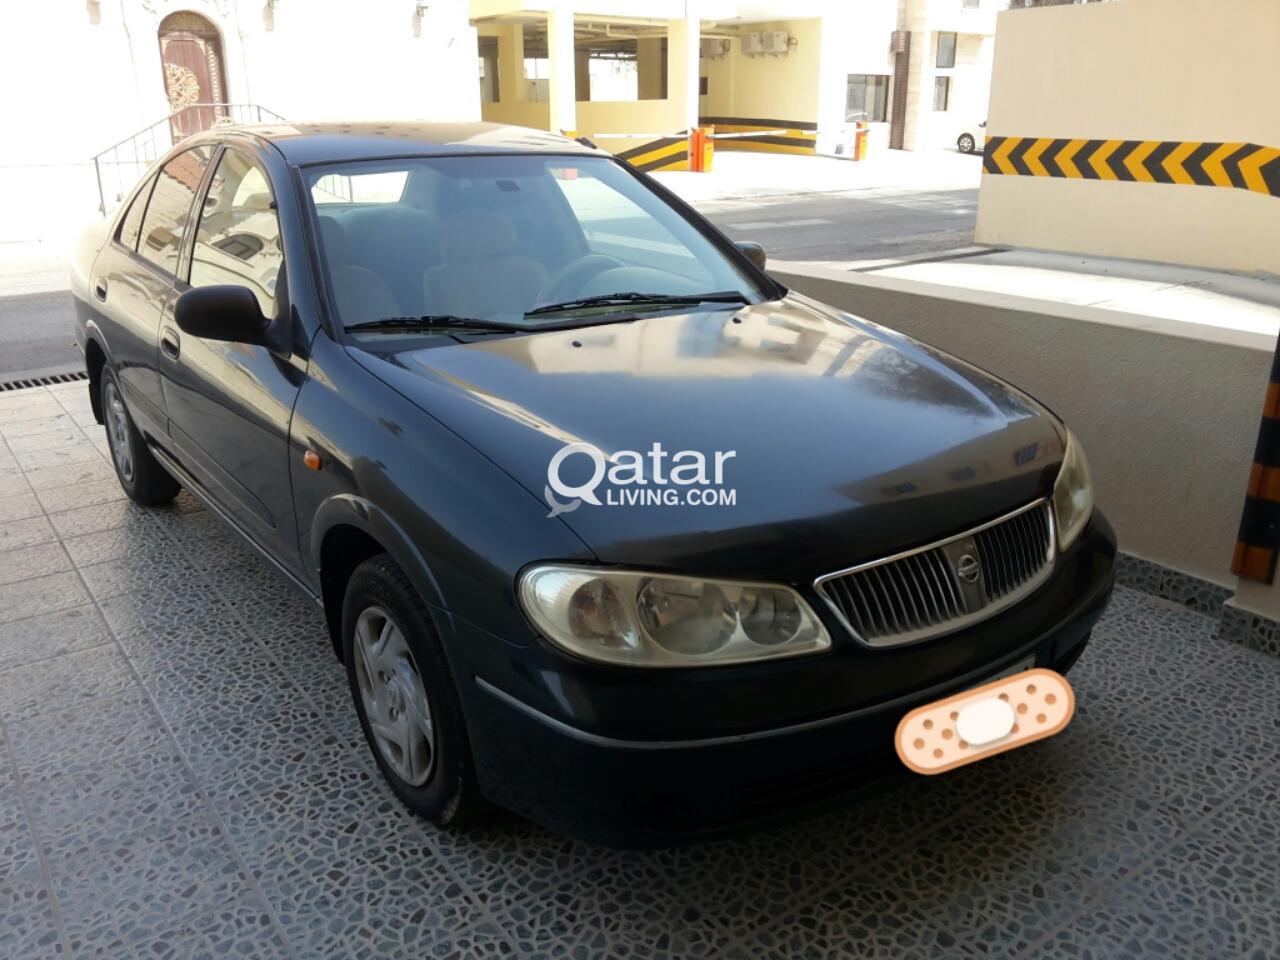 2004 Nissan Sunny Japanese Model Qatar Living